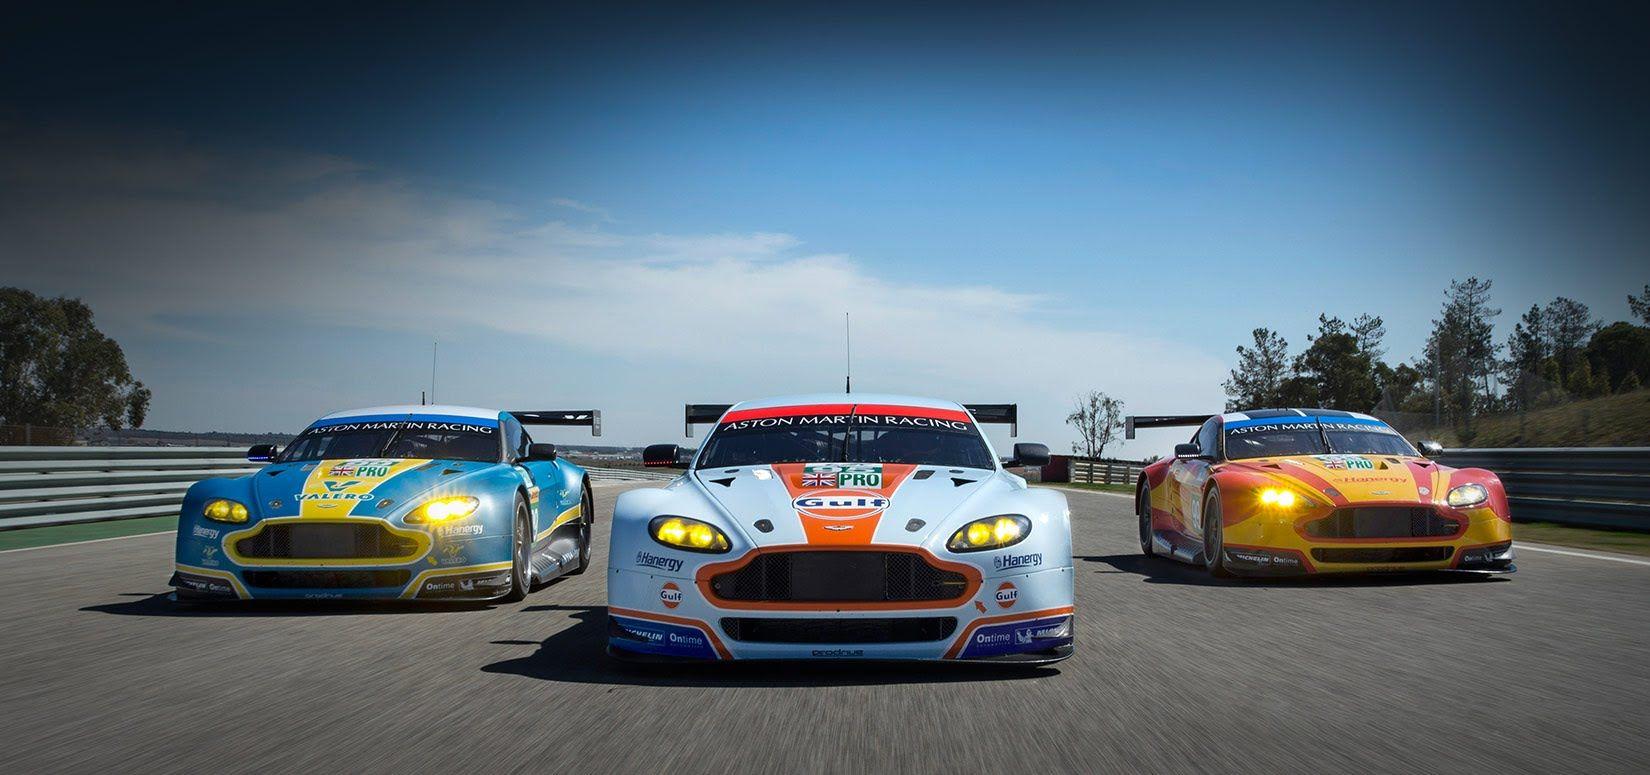 Aston Martin Racing Fia World Endurance Championship 2015